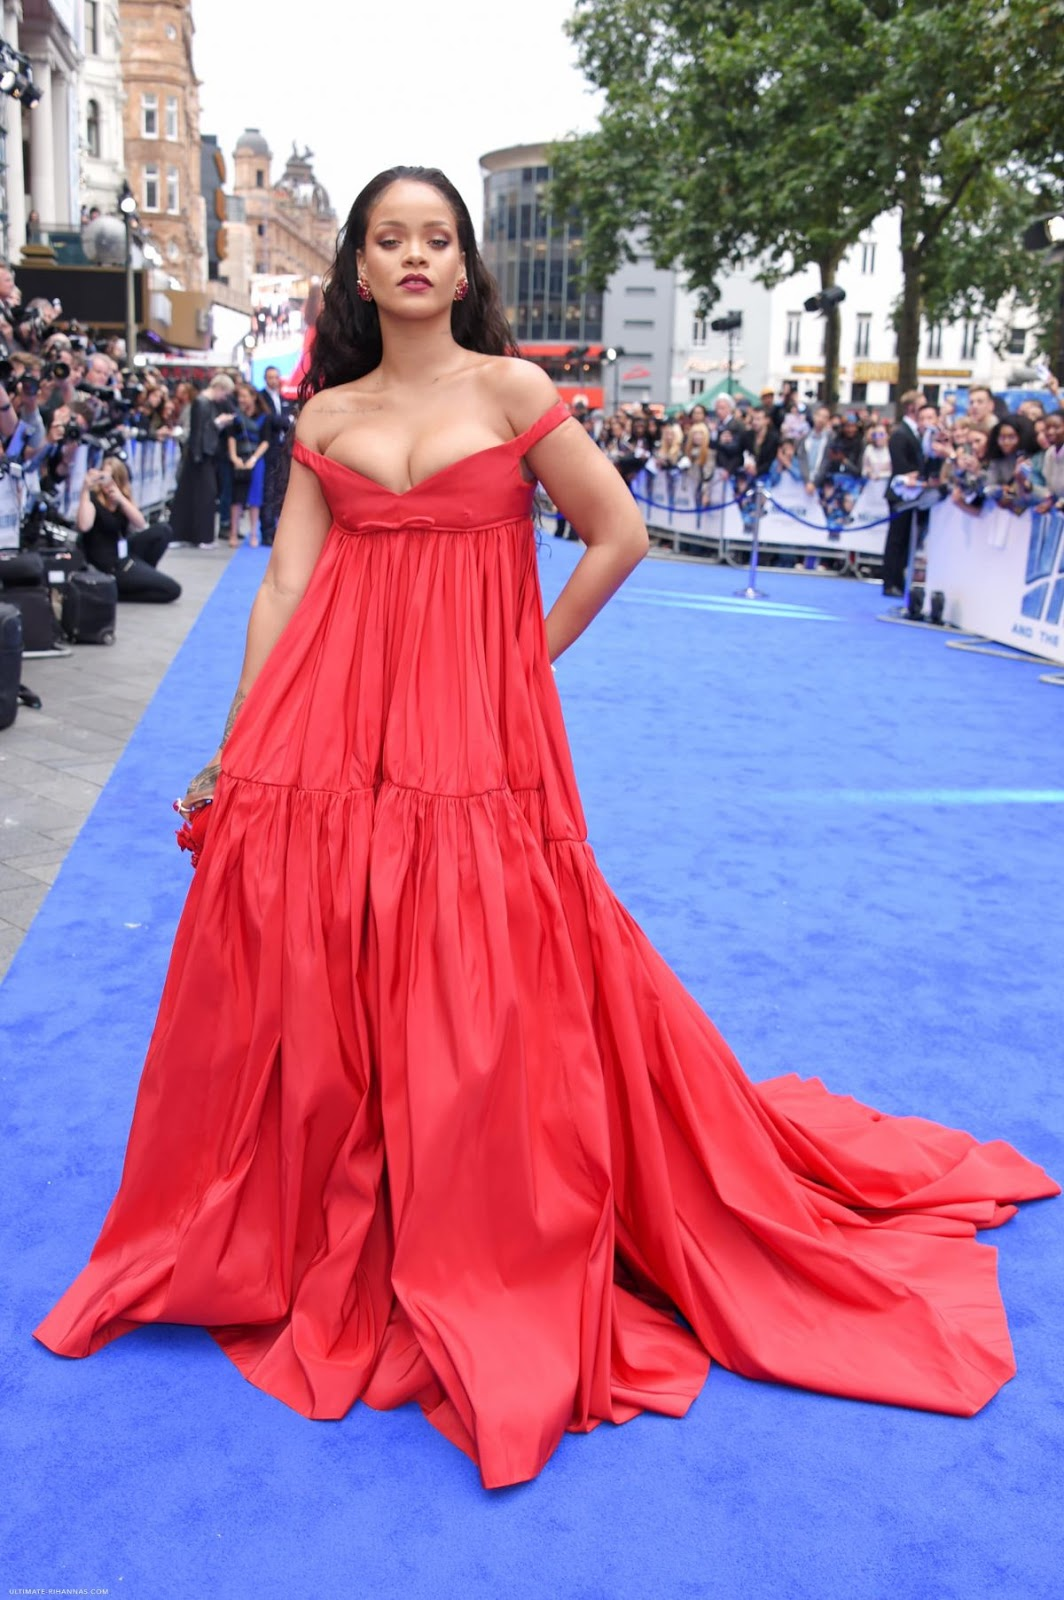 Fashion fan blog from industry supermodels: RIHANNA at ...